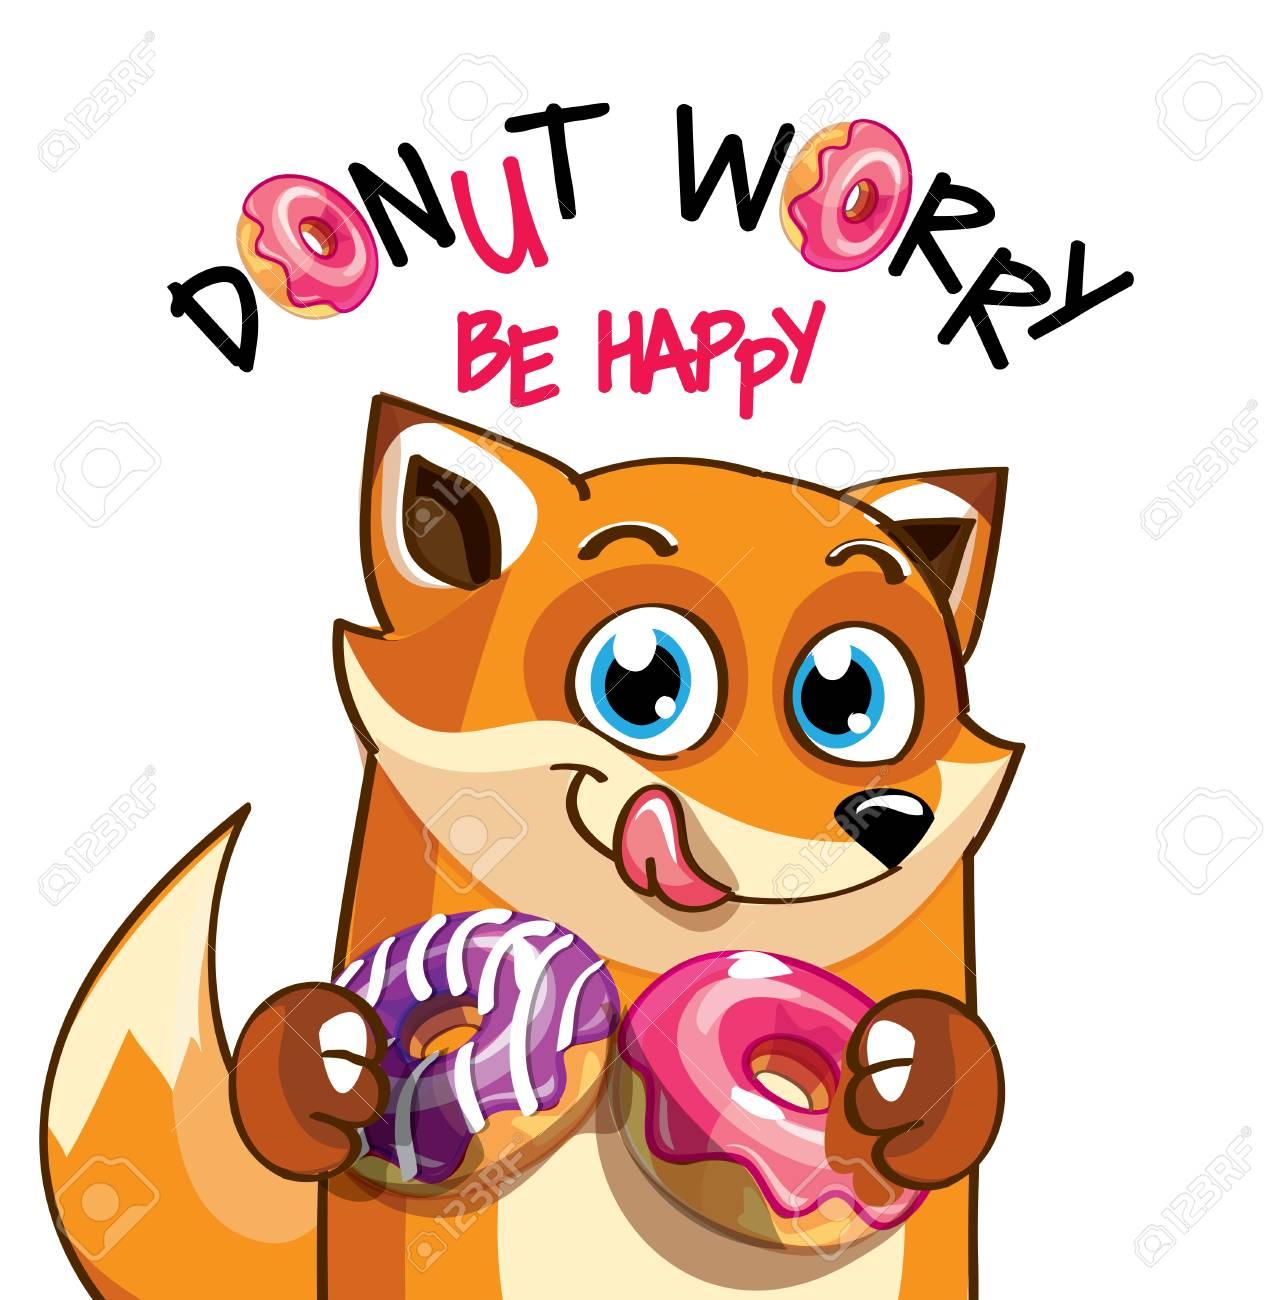 Vector illustration of cartoon fox with donuts. - 98896100